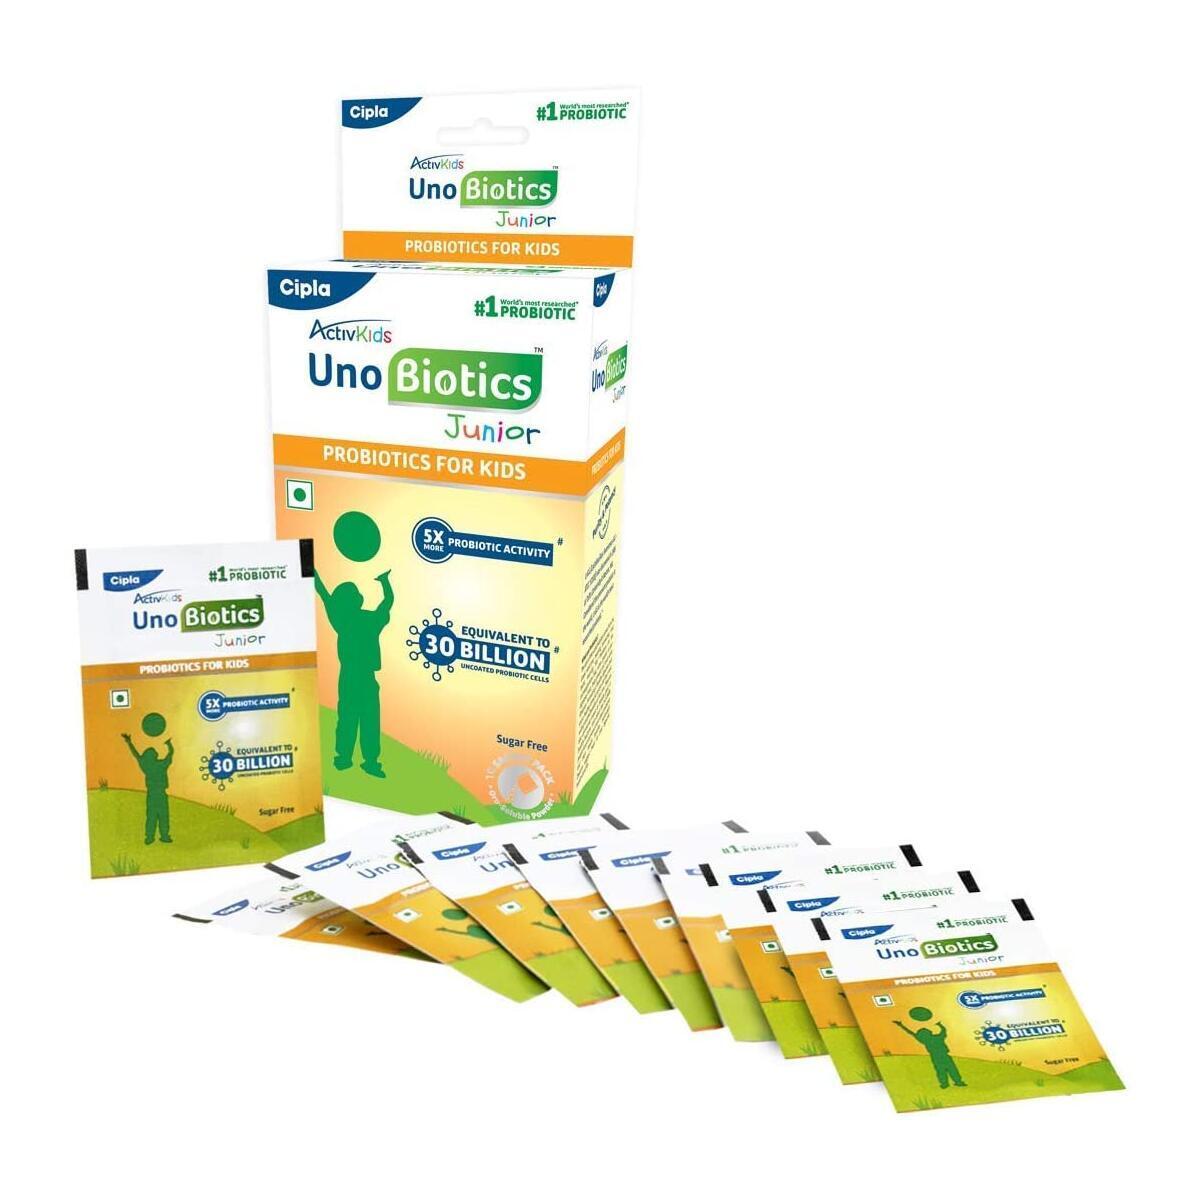 Cipla ActivKids Unobiotics Junior with 5X More Probiotic Activity-Helps Build Immunity & Refills Good Bacteria–Probiotics for Kids 10 Sachet Pack